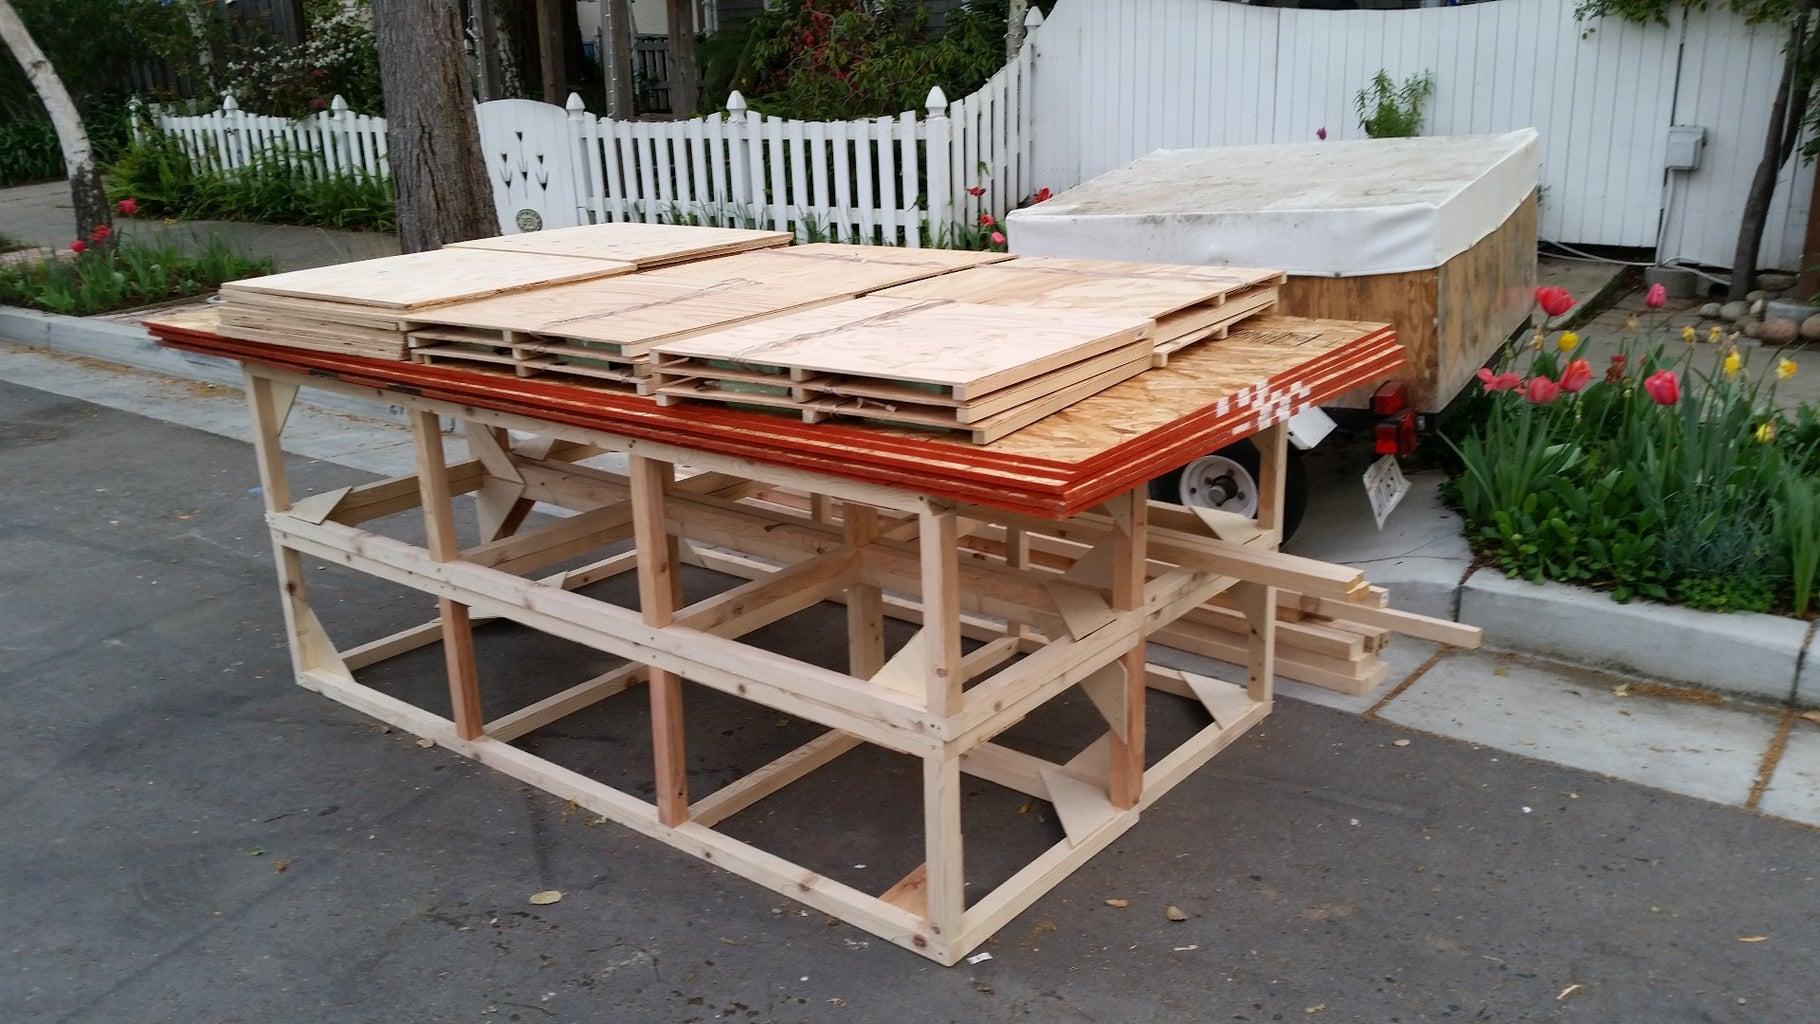 Step 3: Fabrication